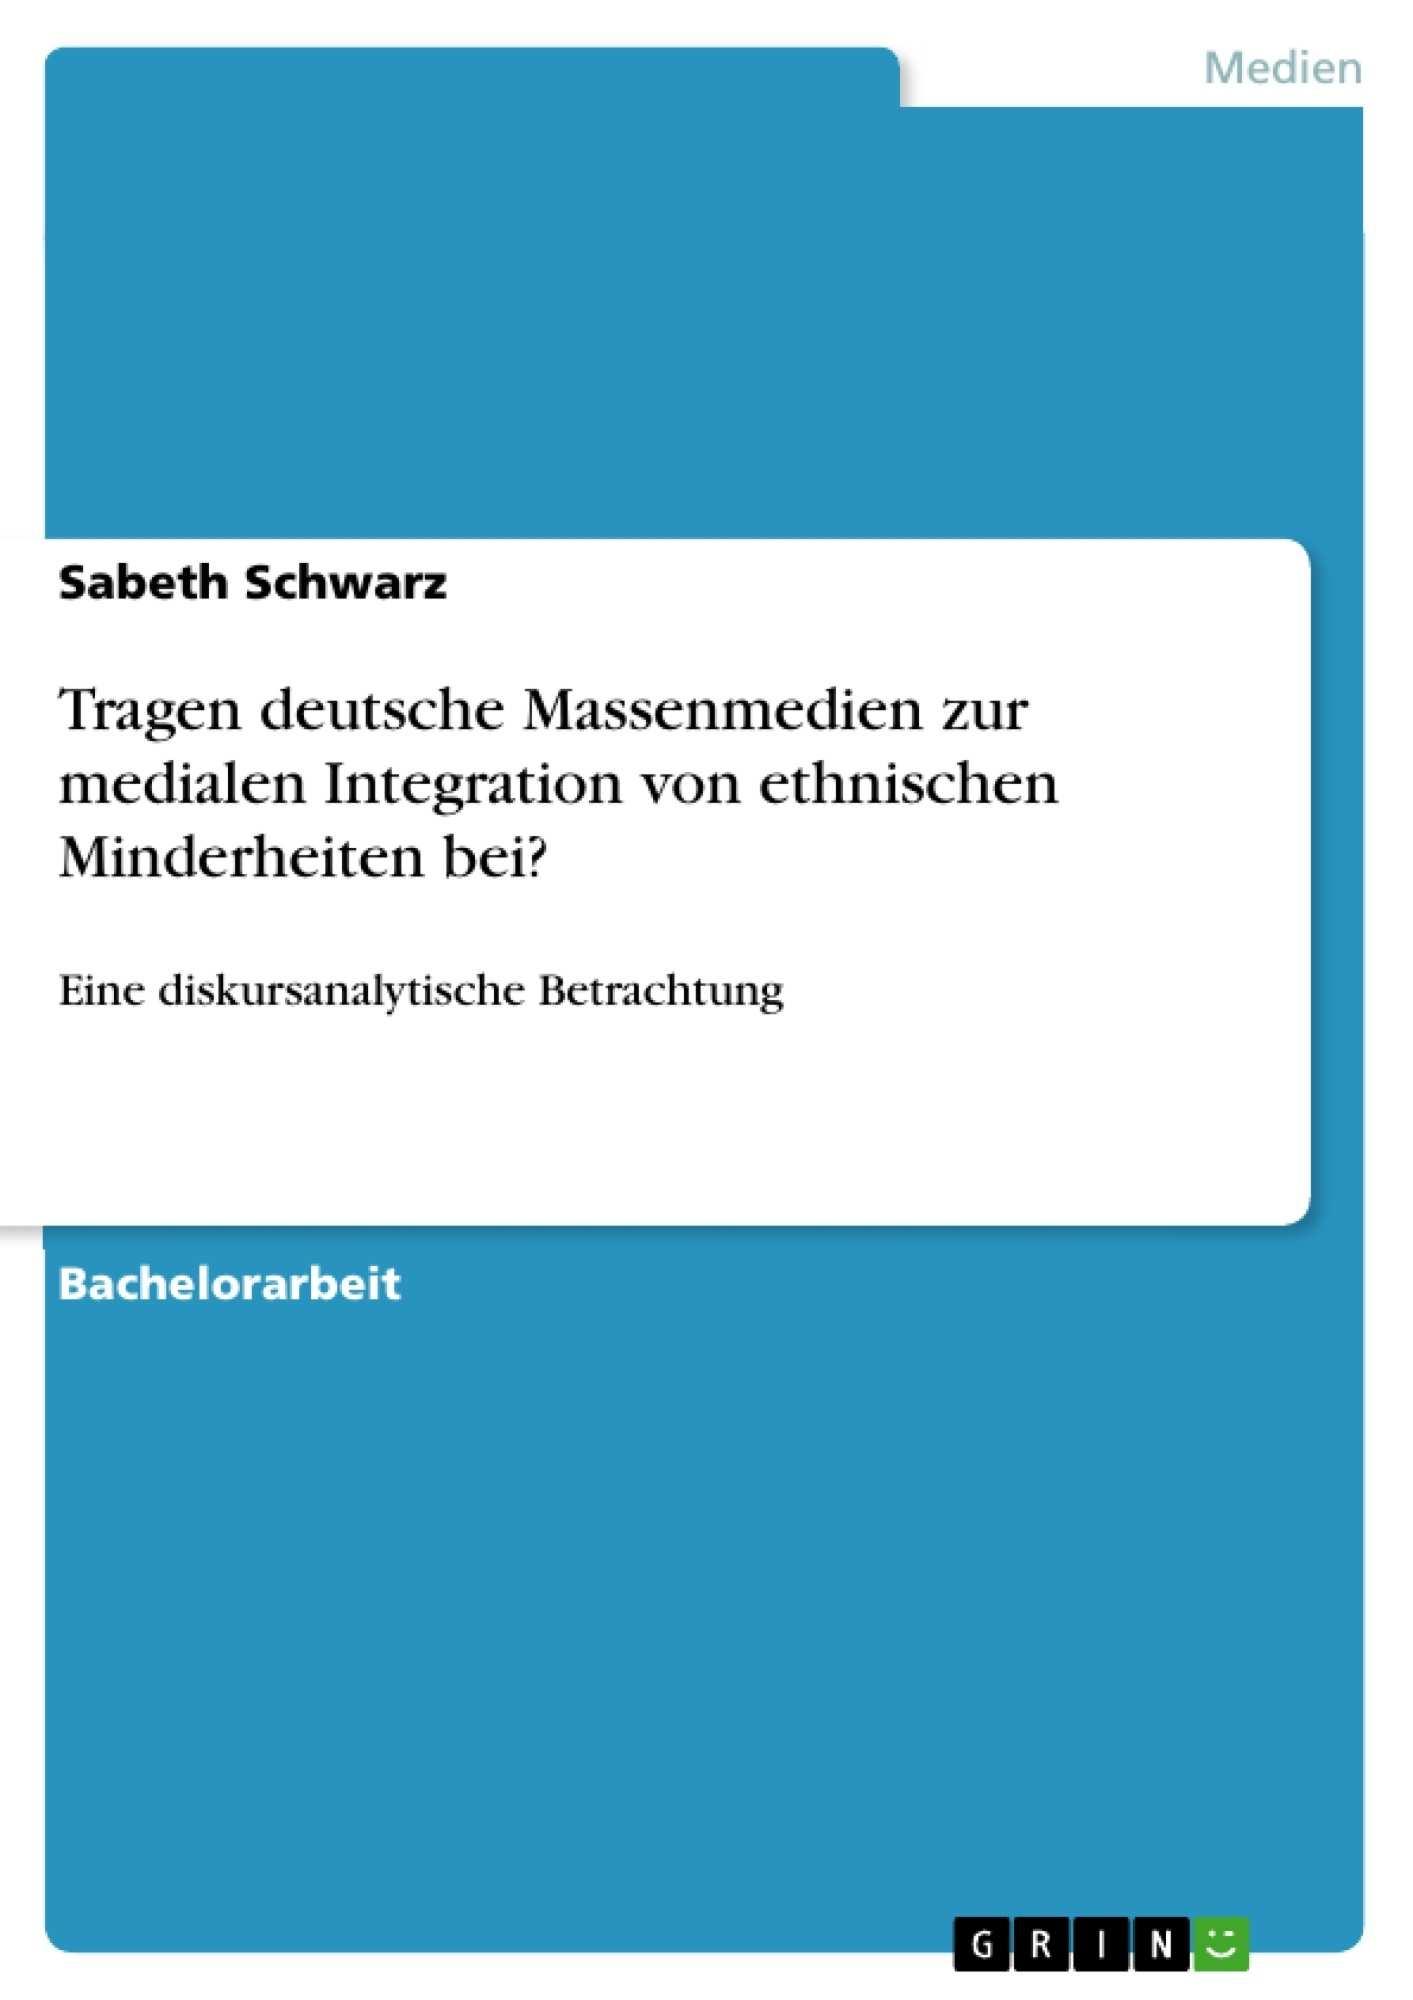 Tragen Deutsche Massenmedien Zur Medialen Diplomarbeiten24 De Diplomarbeiten24 De